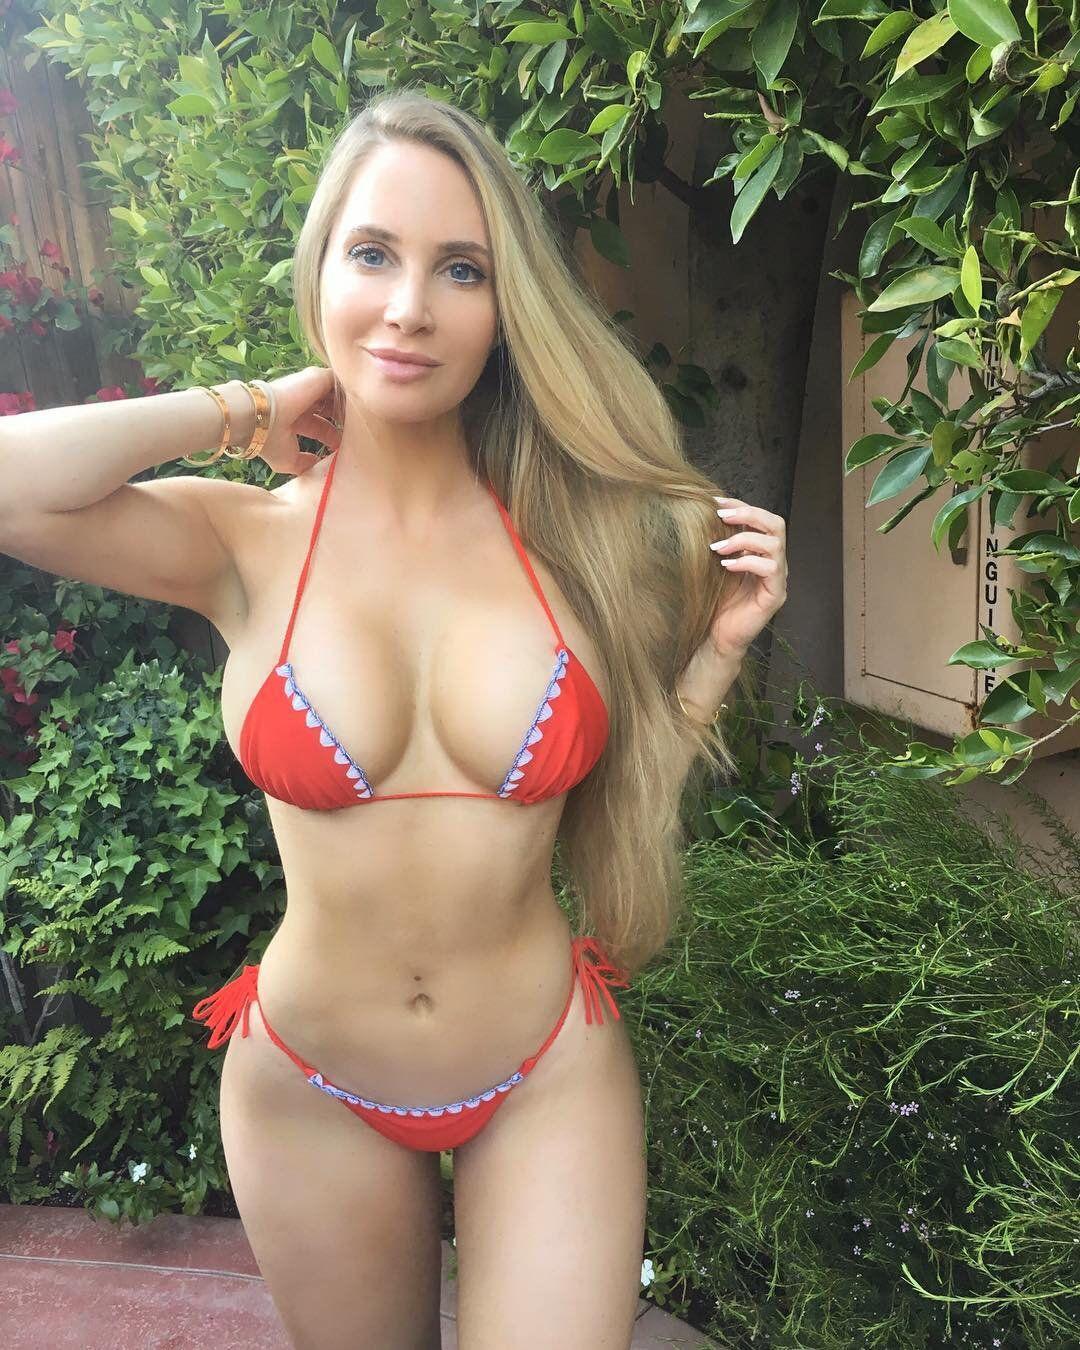 pinbrink on fitness model | pinterest | bikini babes, fitness